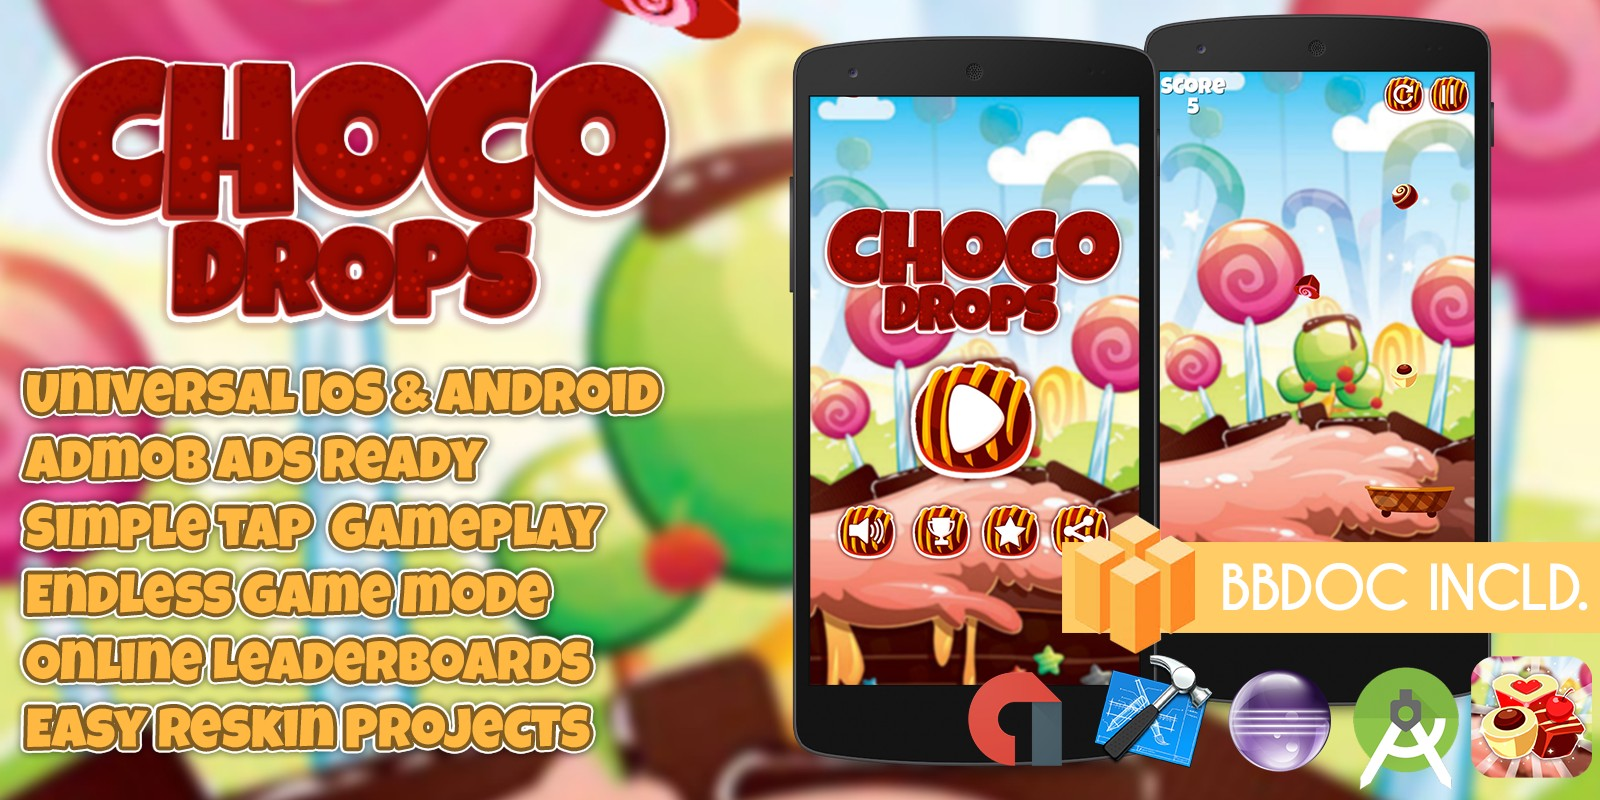 Choco Drops Buildbox Template